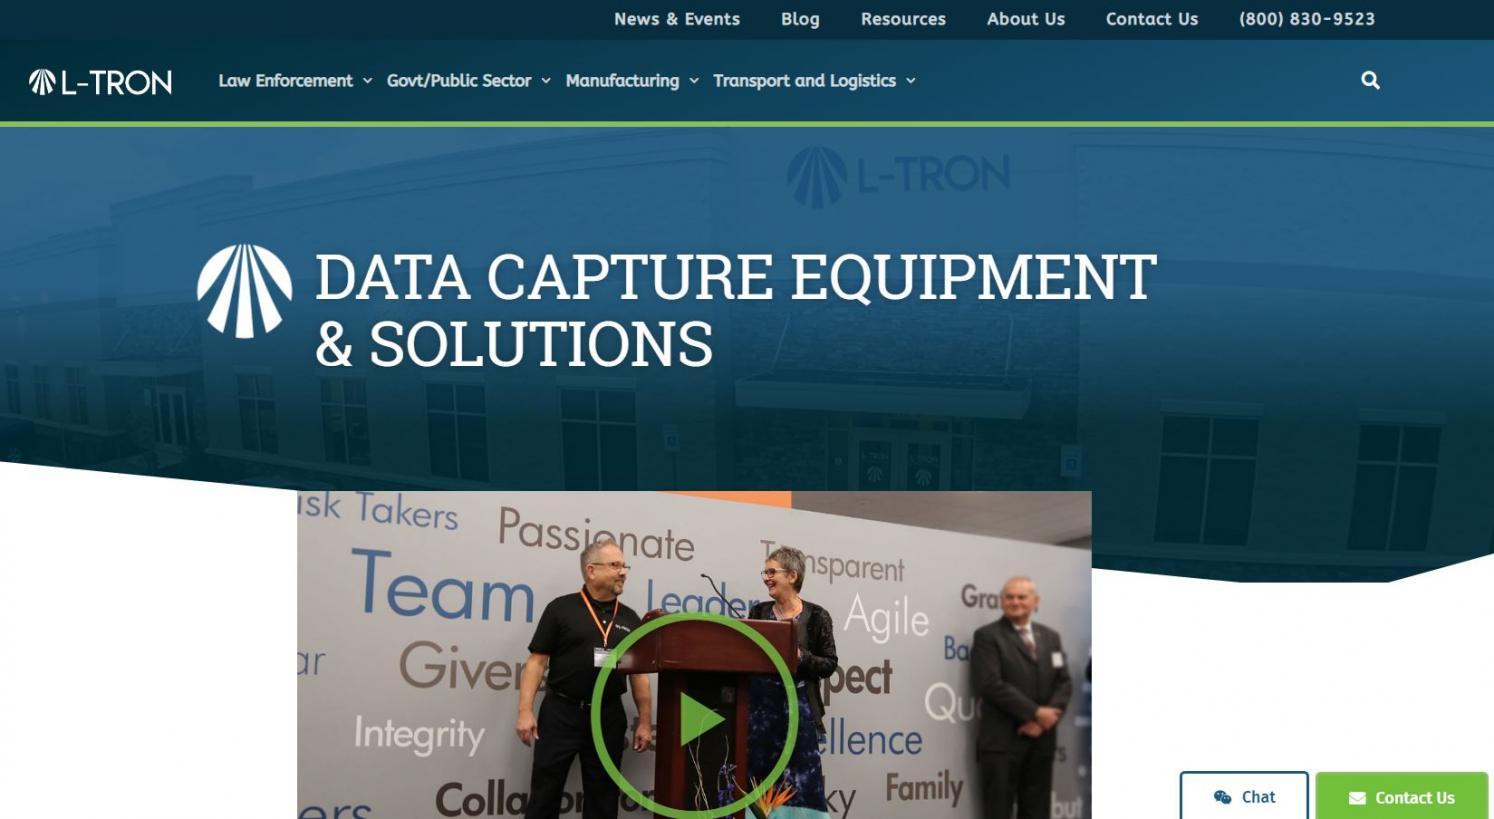 A glimpse at L-Tron's new site.